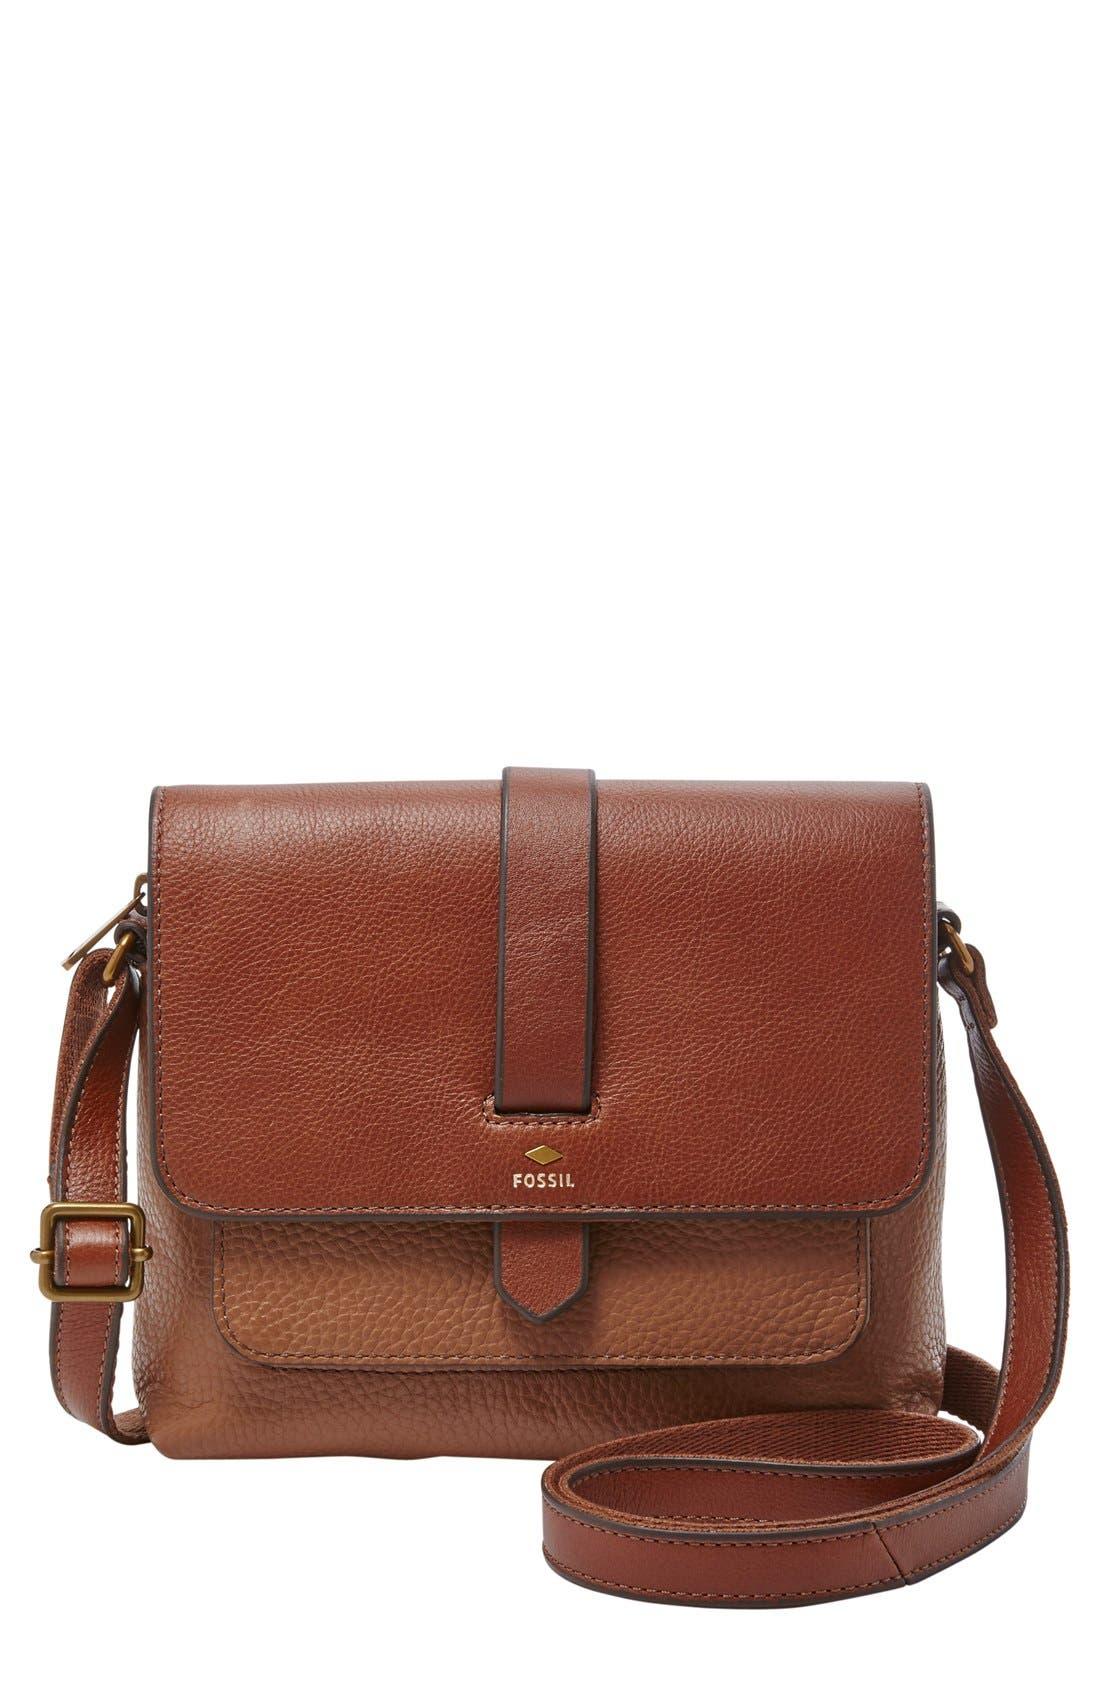 Main Image - Fossil 'Small Kinley' Crossbody Bag